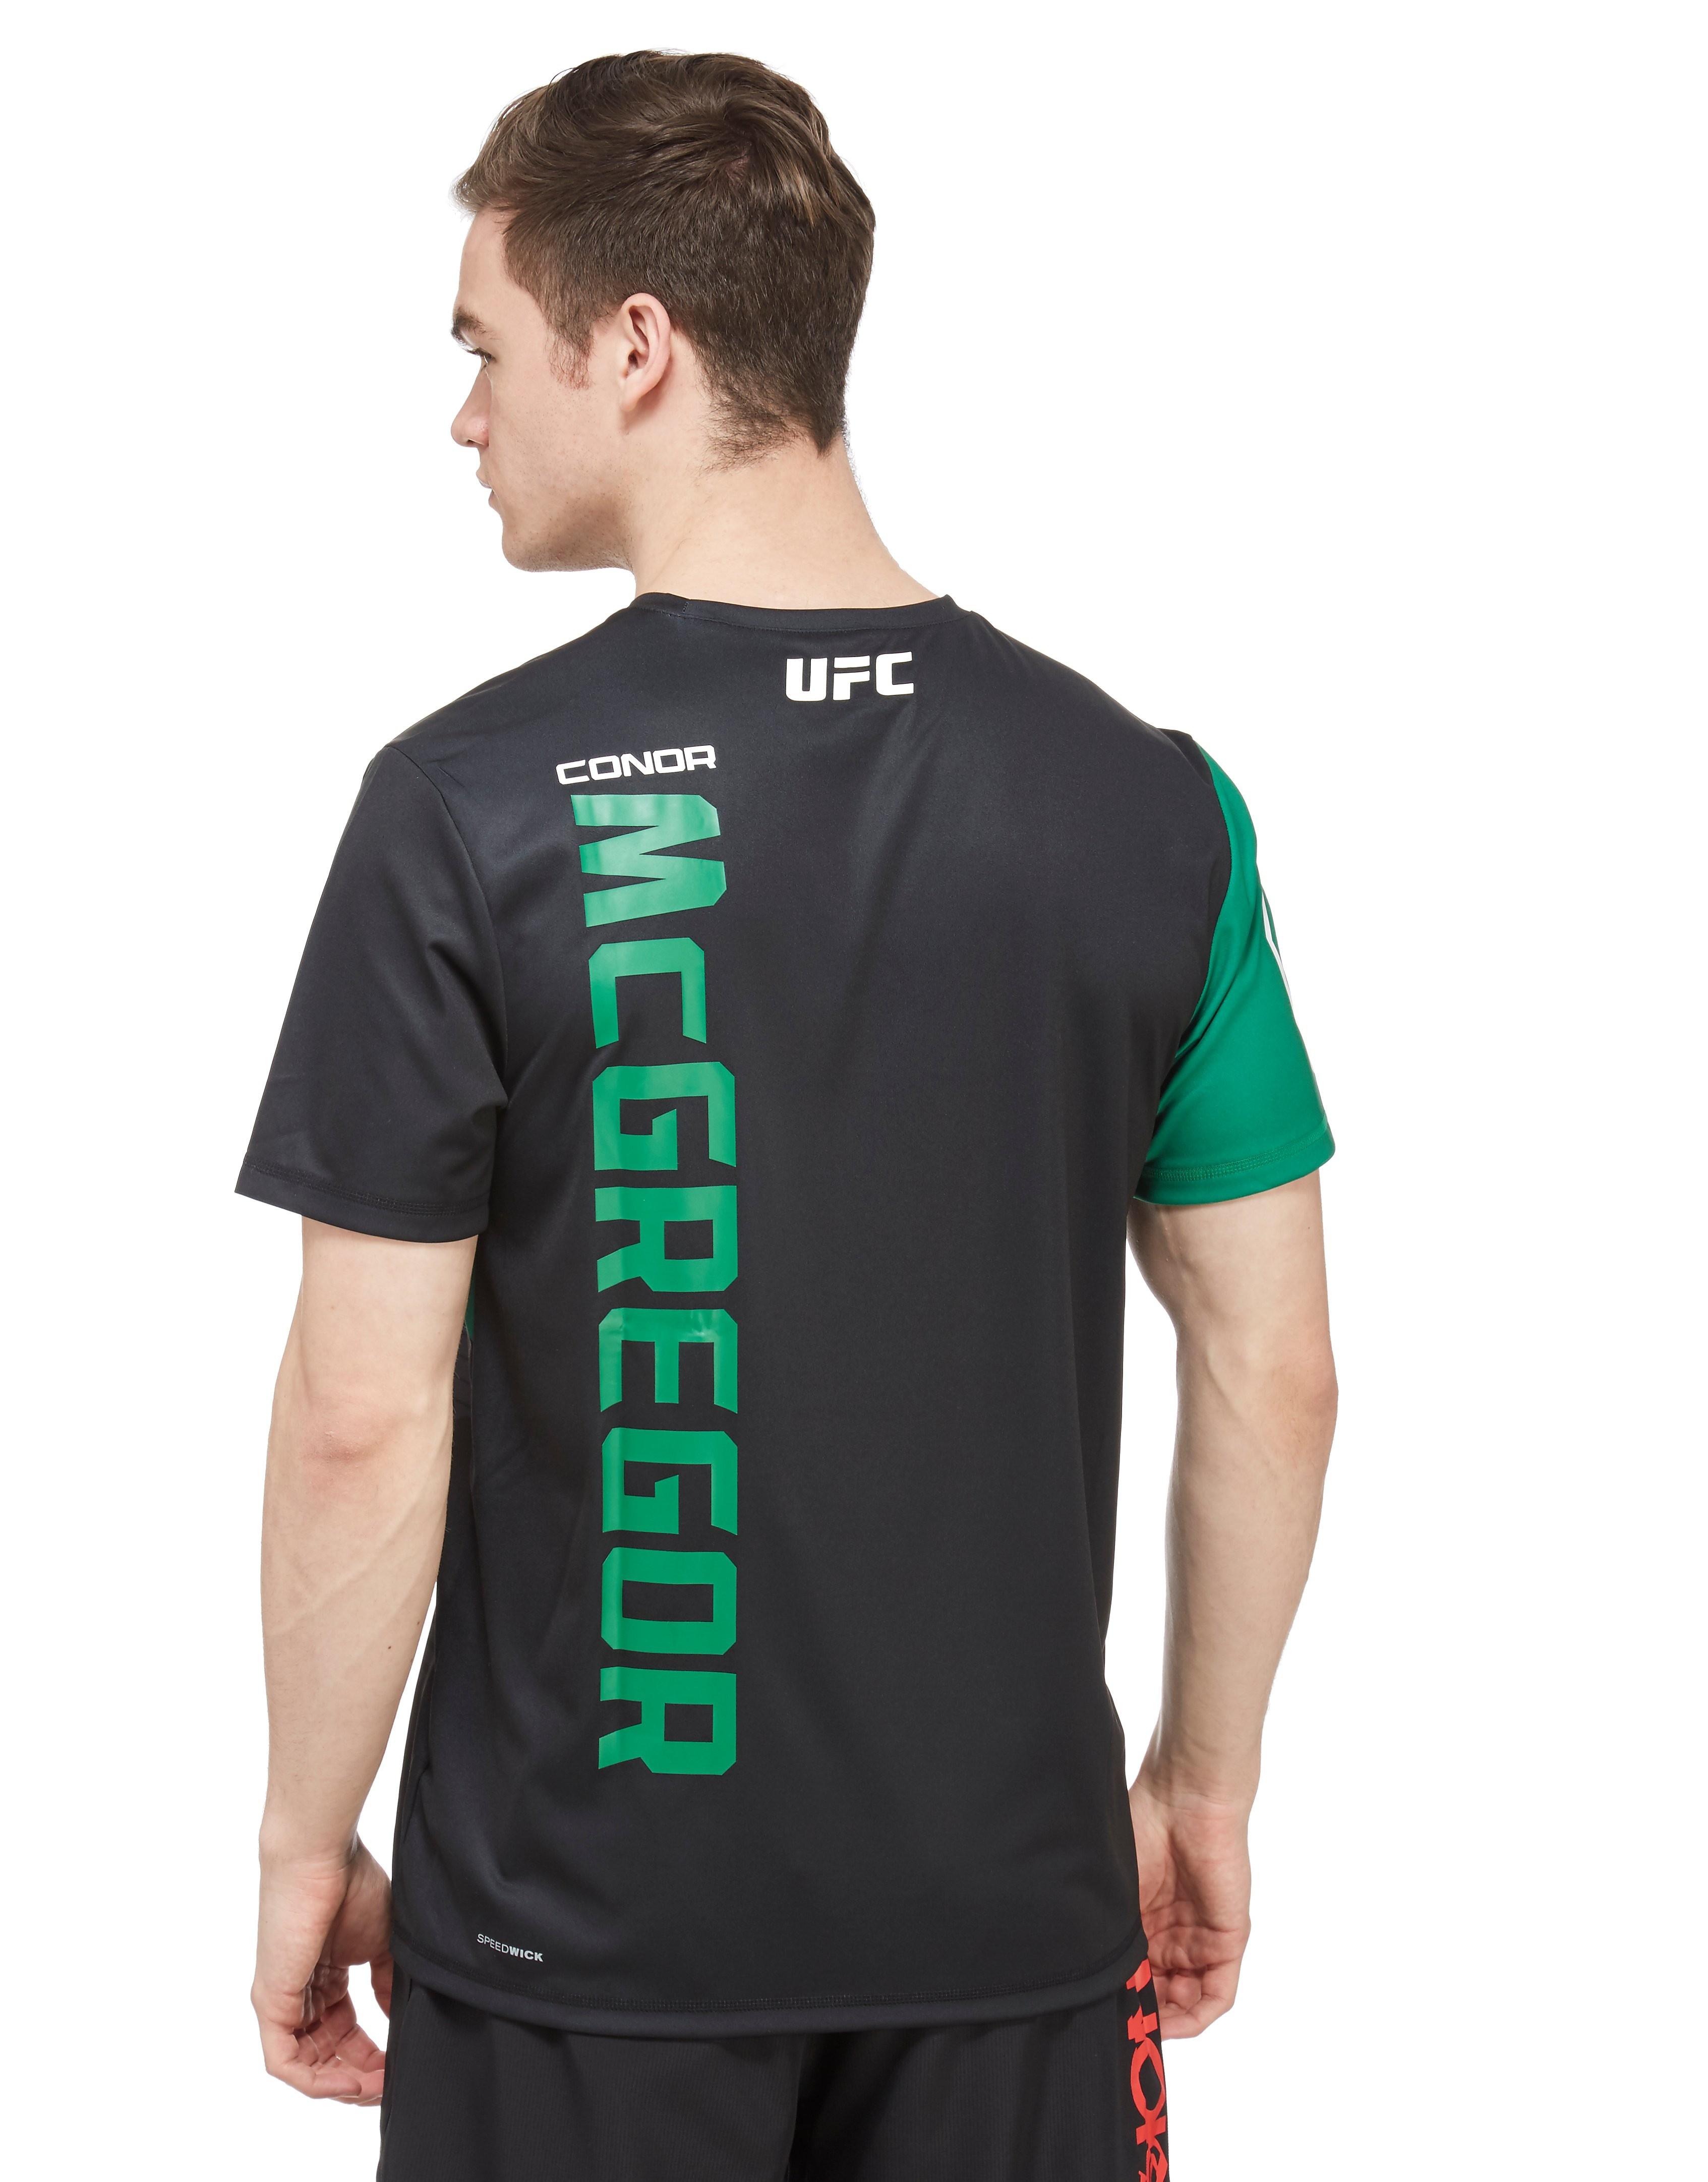 Reebok Camiseta UFC Conor McGregor